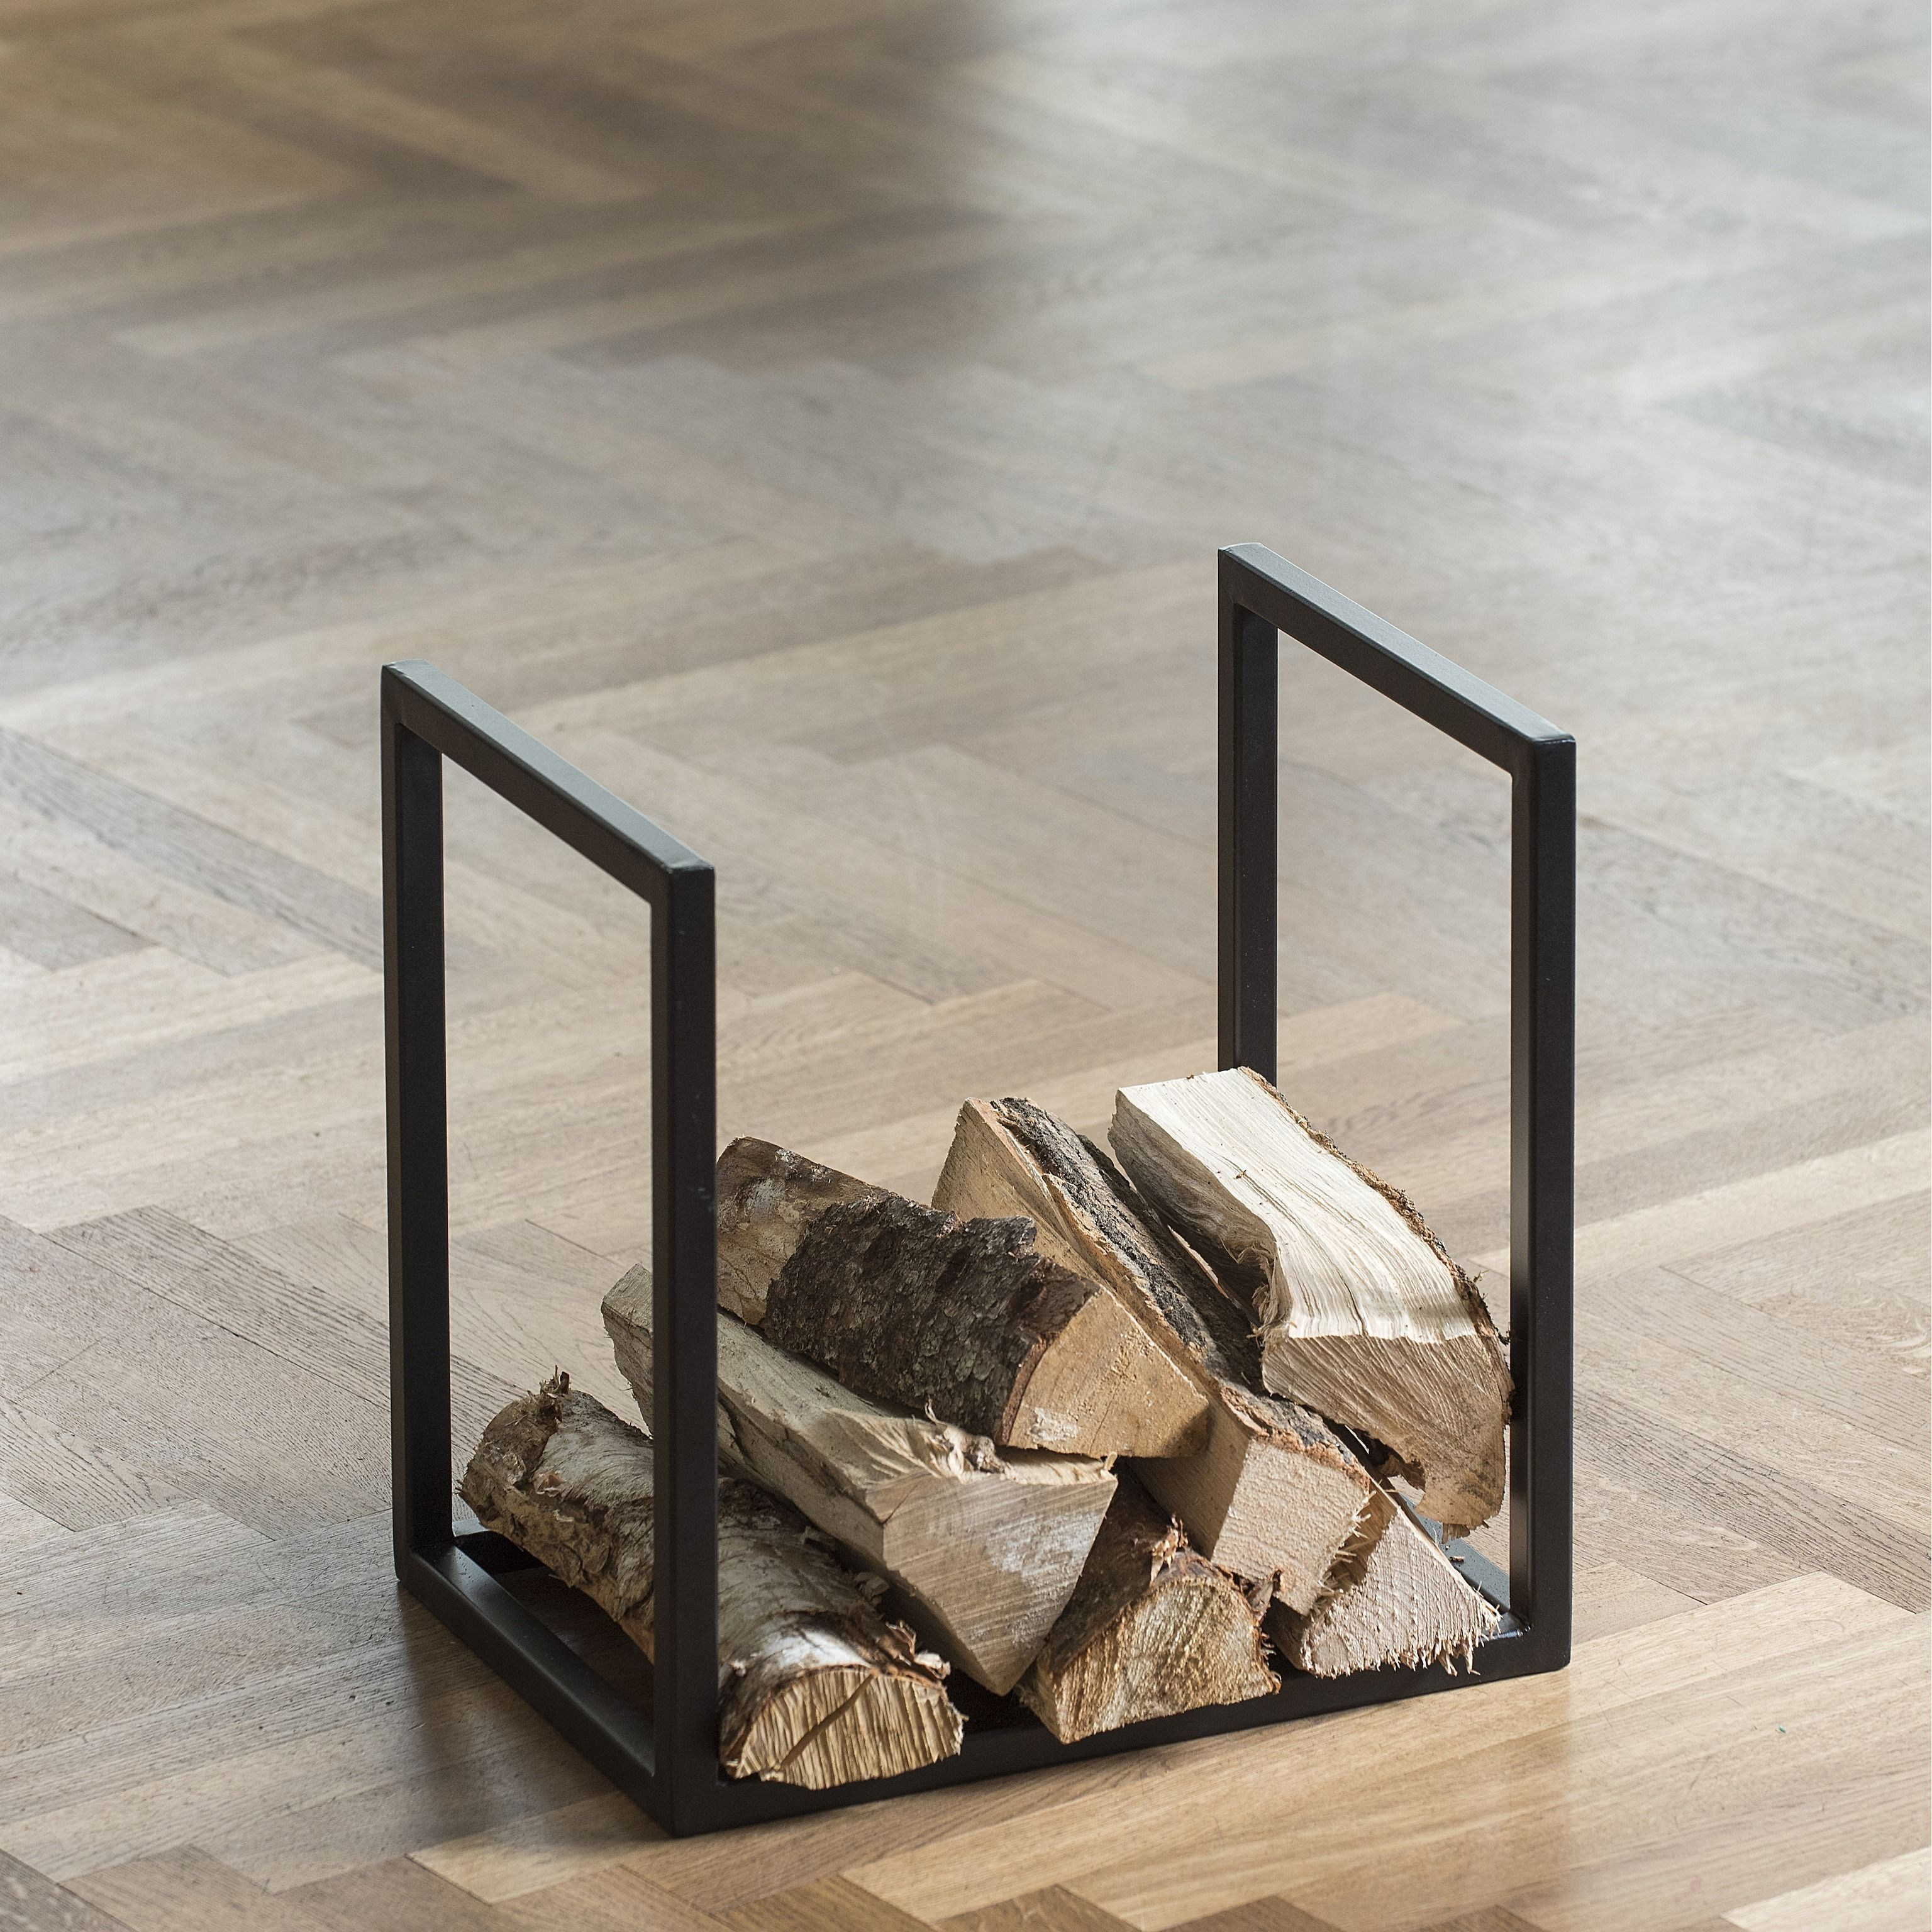 kaminholz st nder zurs schwarz lackiert 40 x 30 x 40 cm. Black Bedroom Furniture Sets. Home Design Ideas